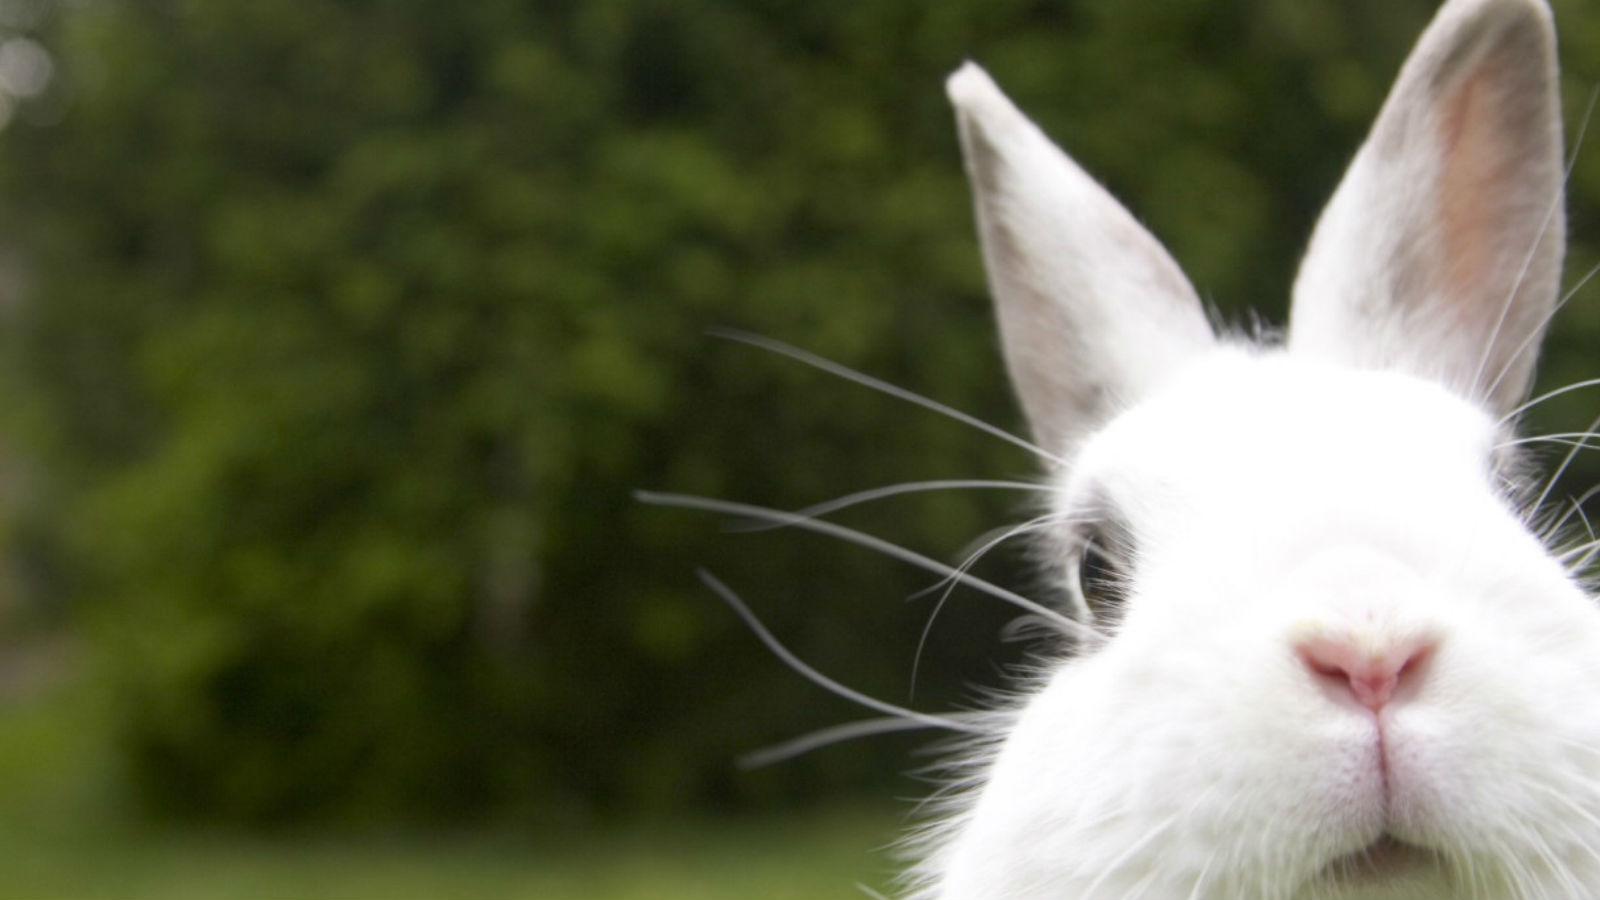 Sheraton Melb Easter - 1600x900.jpg